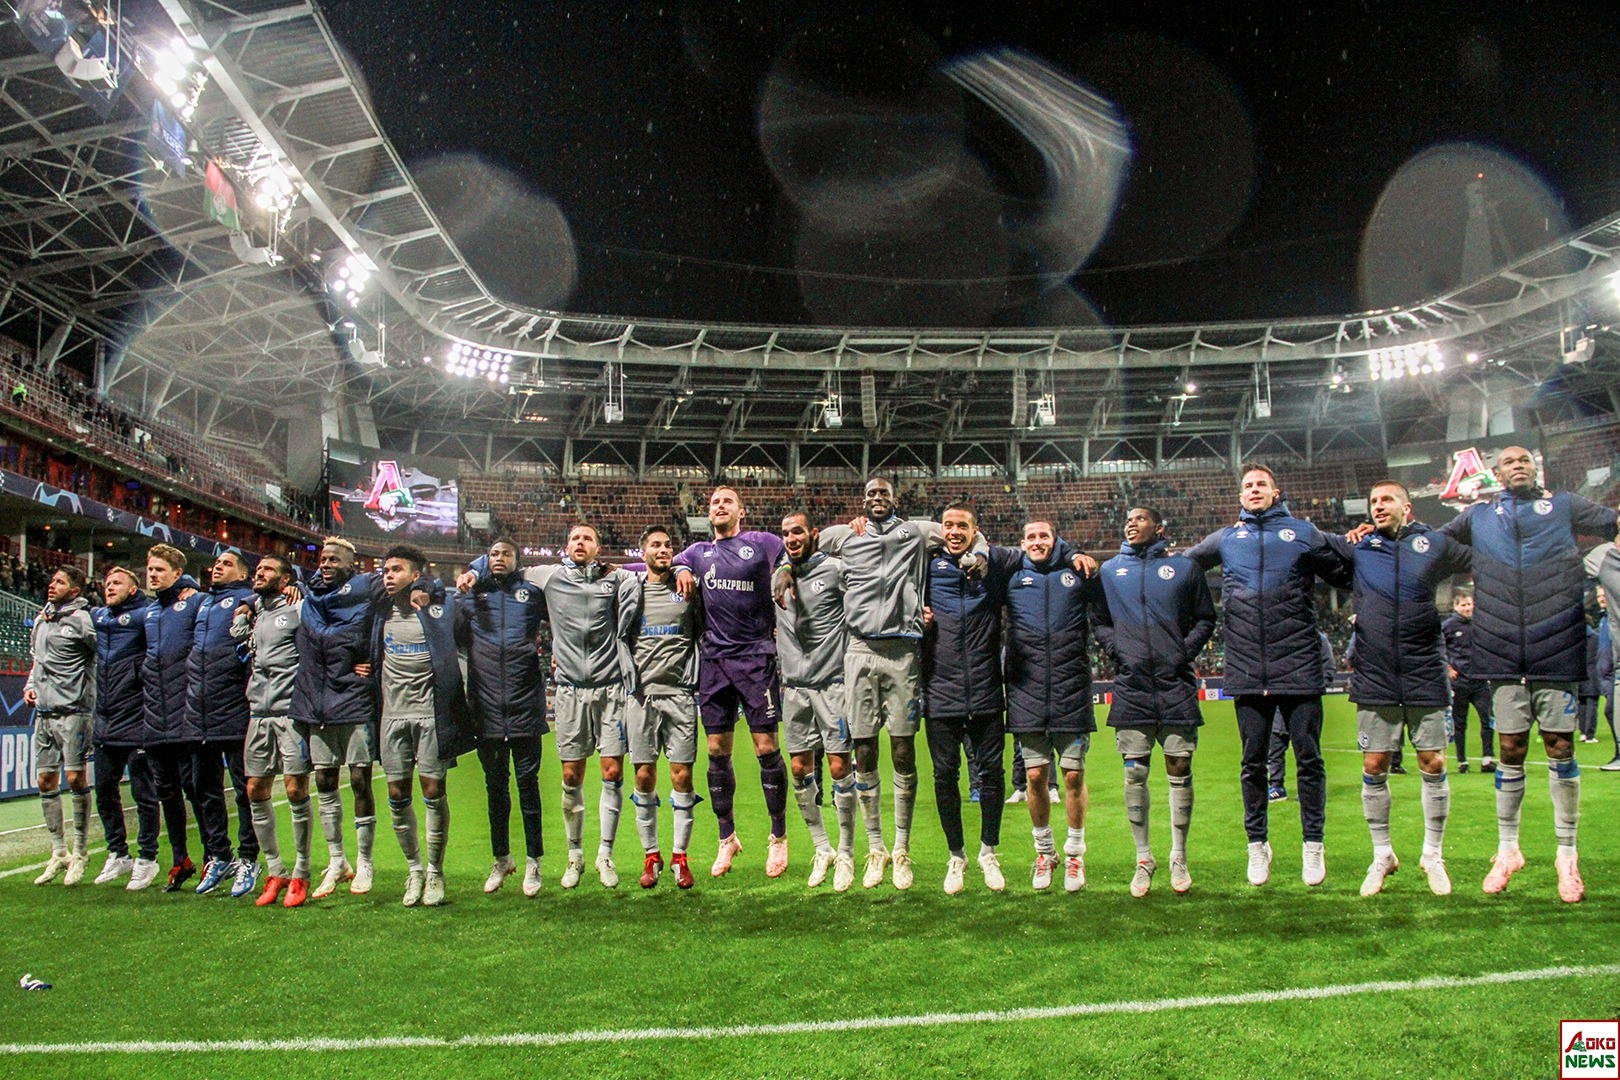 ФК Шальке 04. Фото: Дмитрий Бурдонов / Loko.News